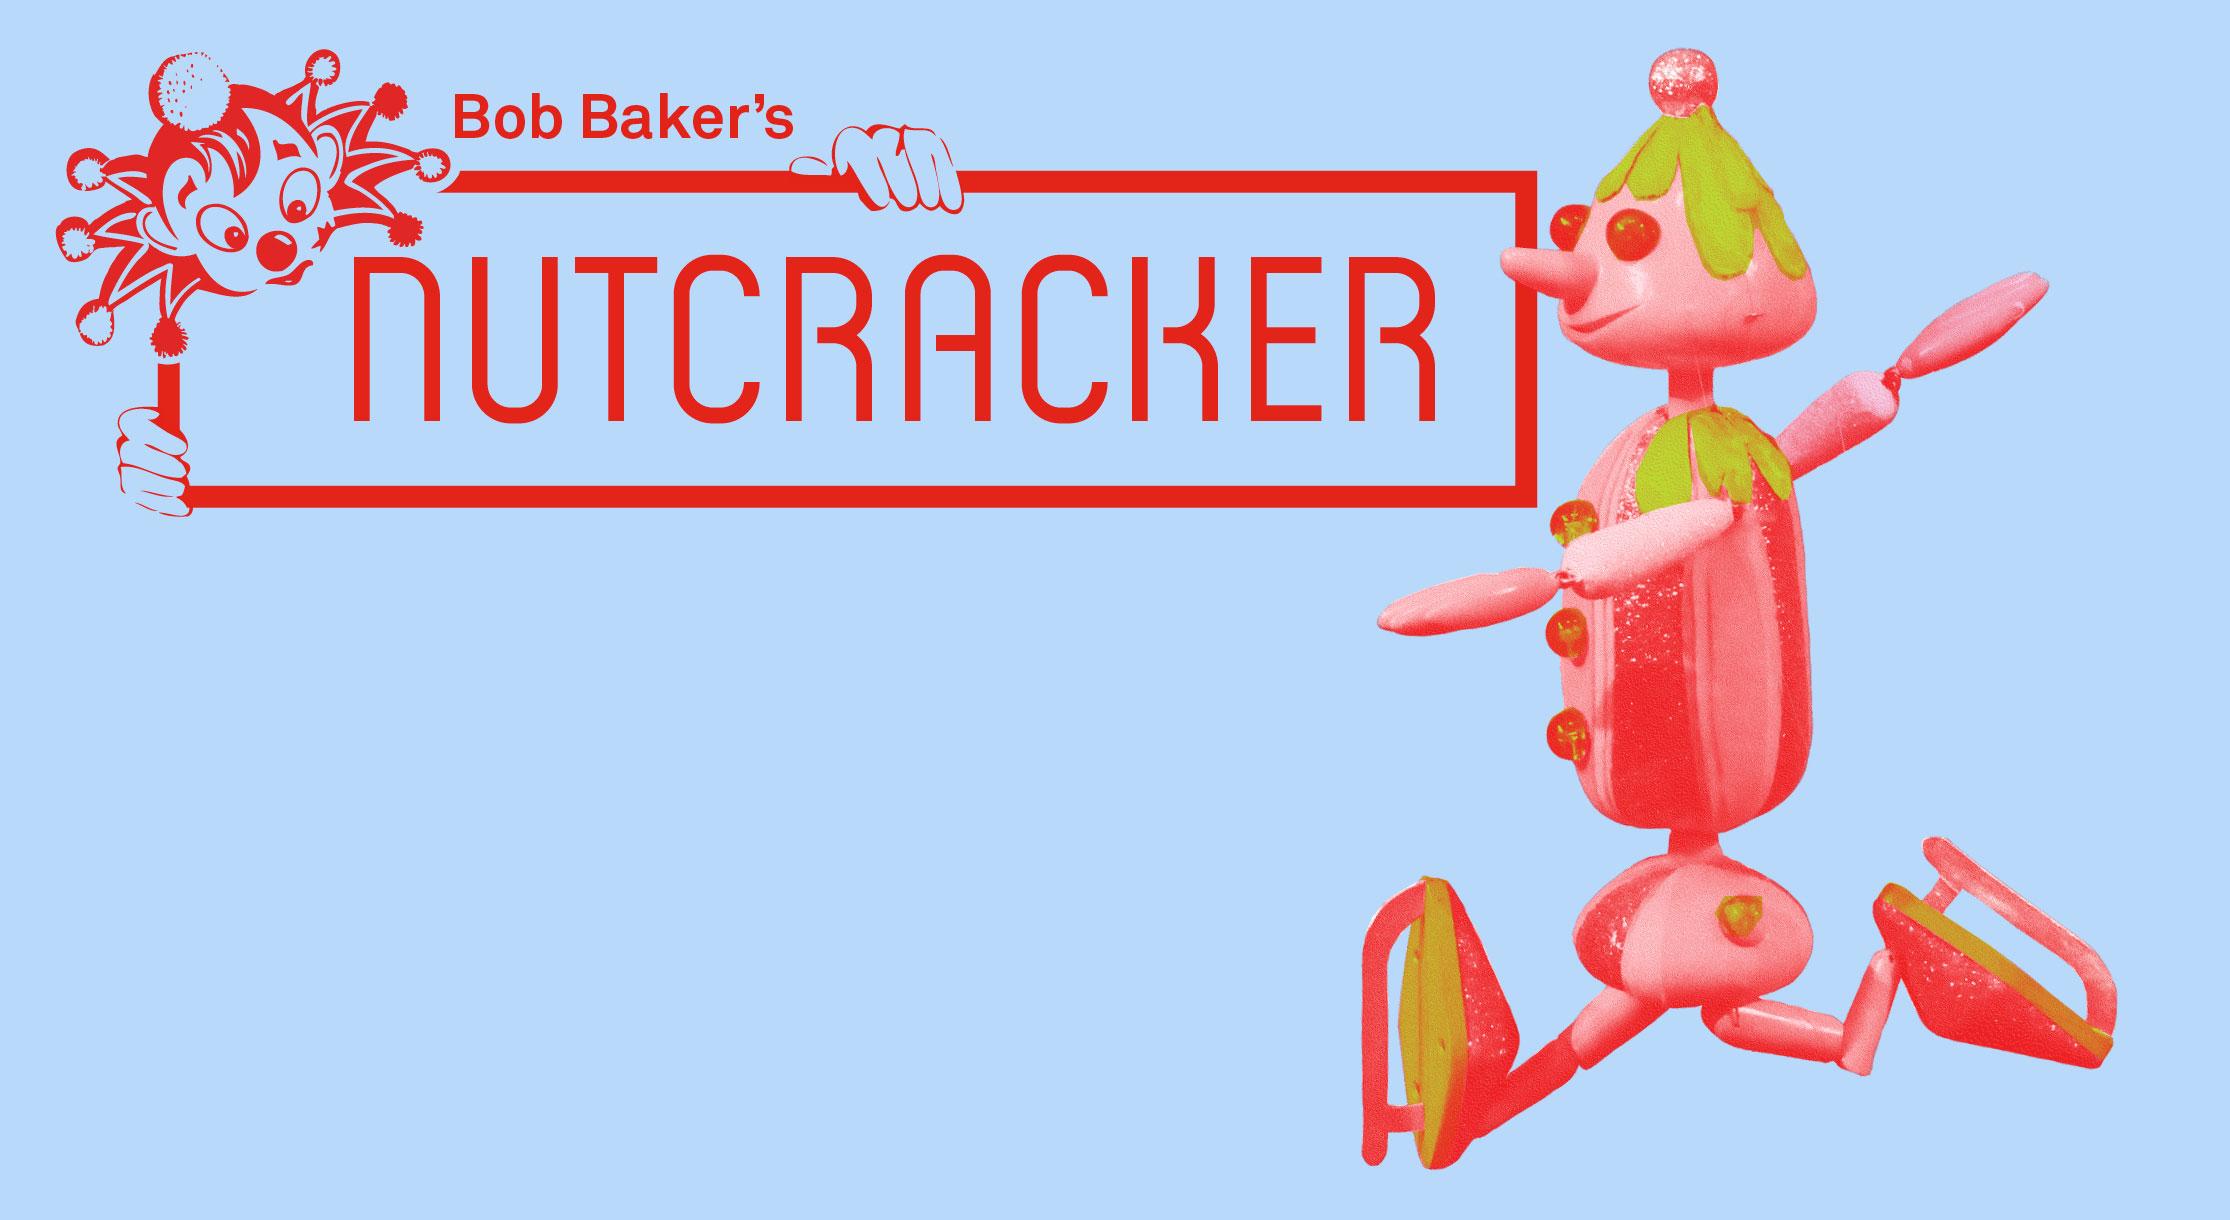 Bob Baker's Nutcracker